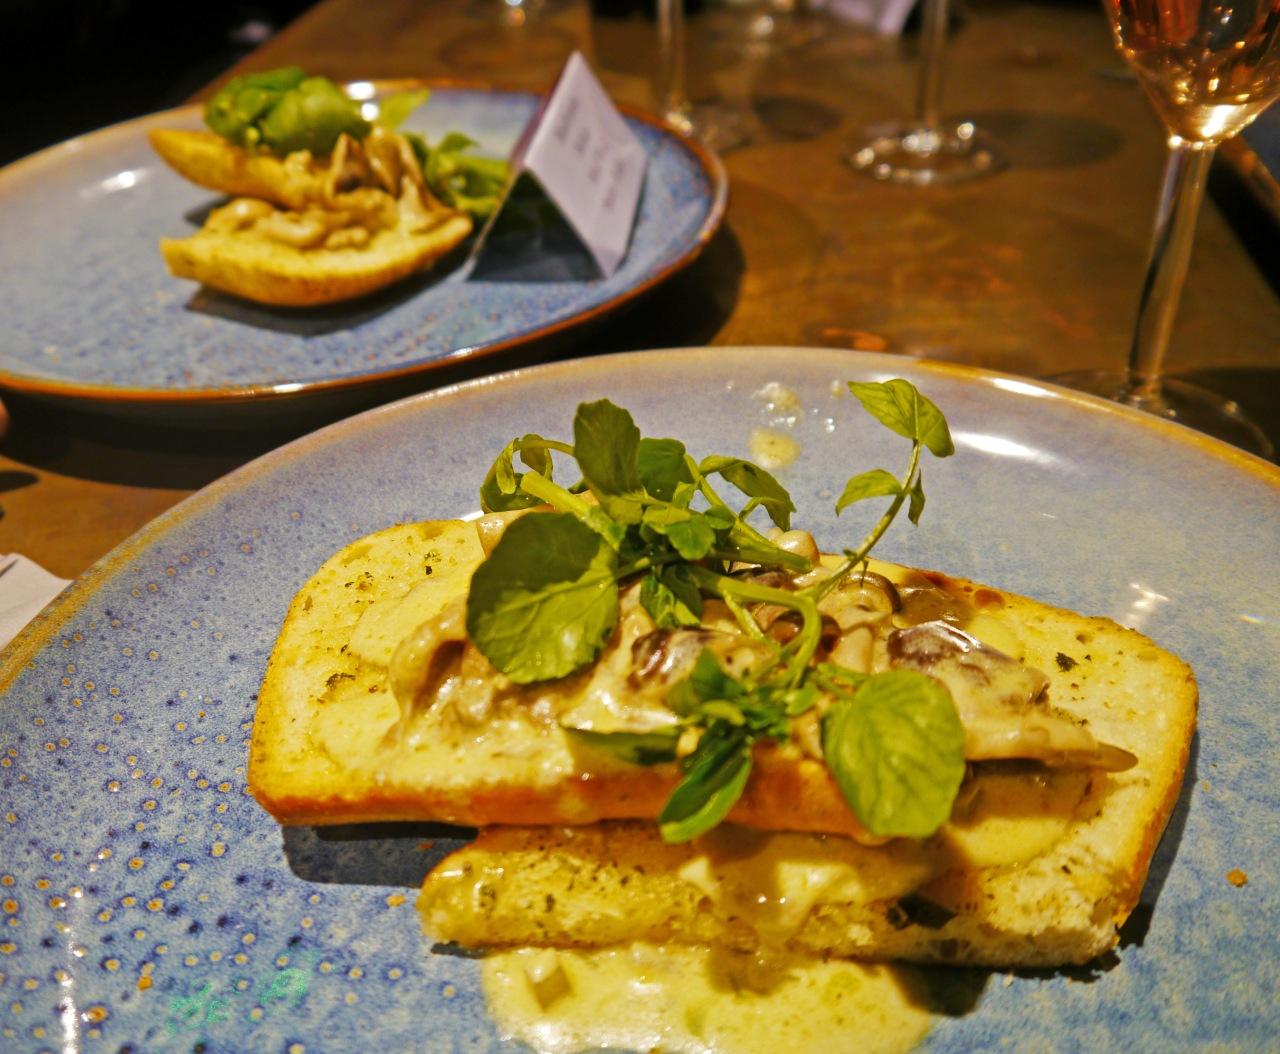 Garlic and herb creamy mushrooms on focaccia bread